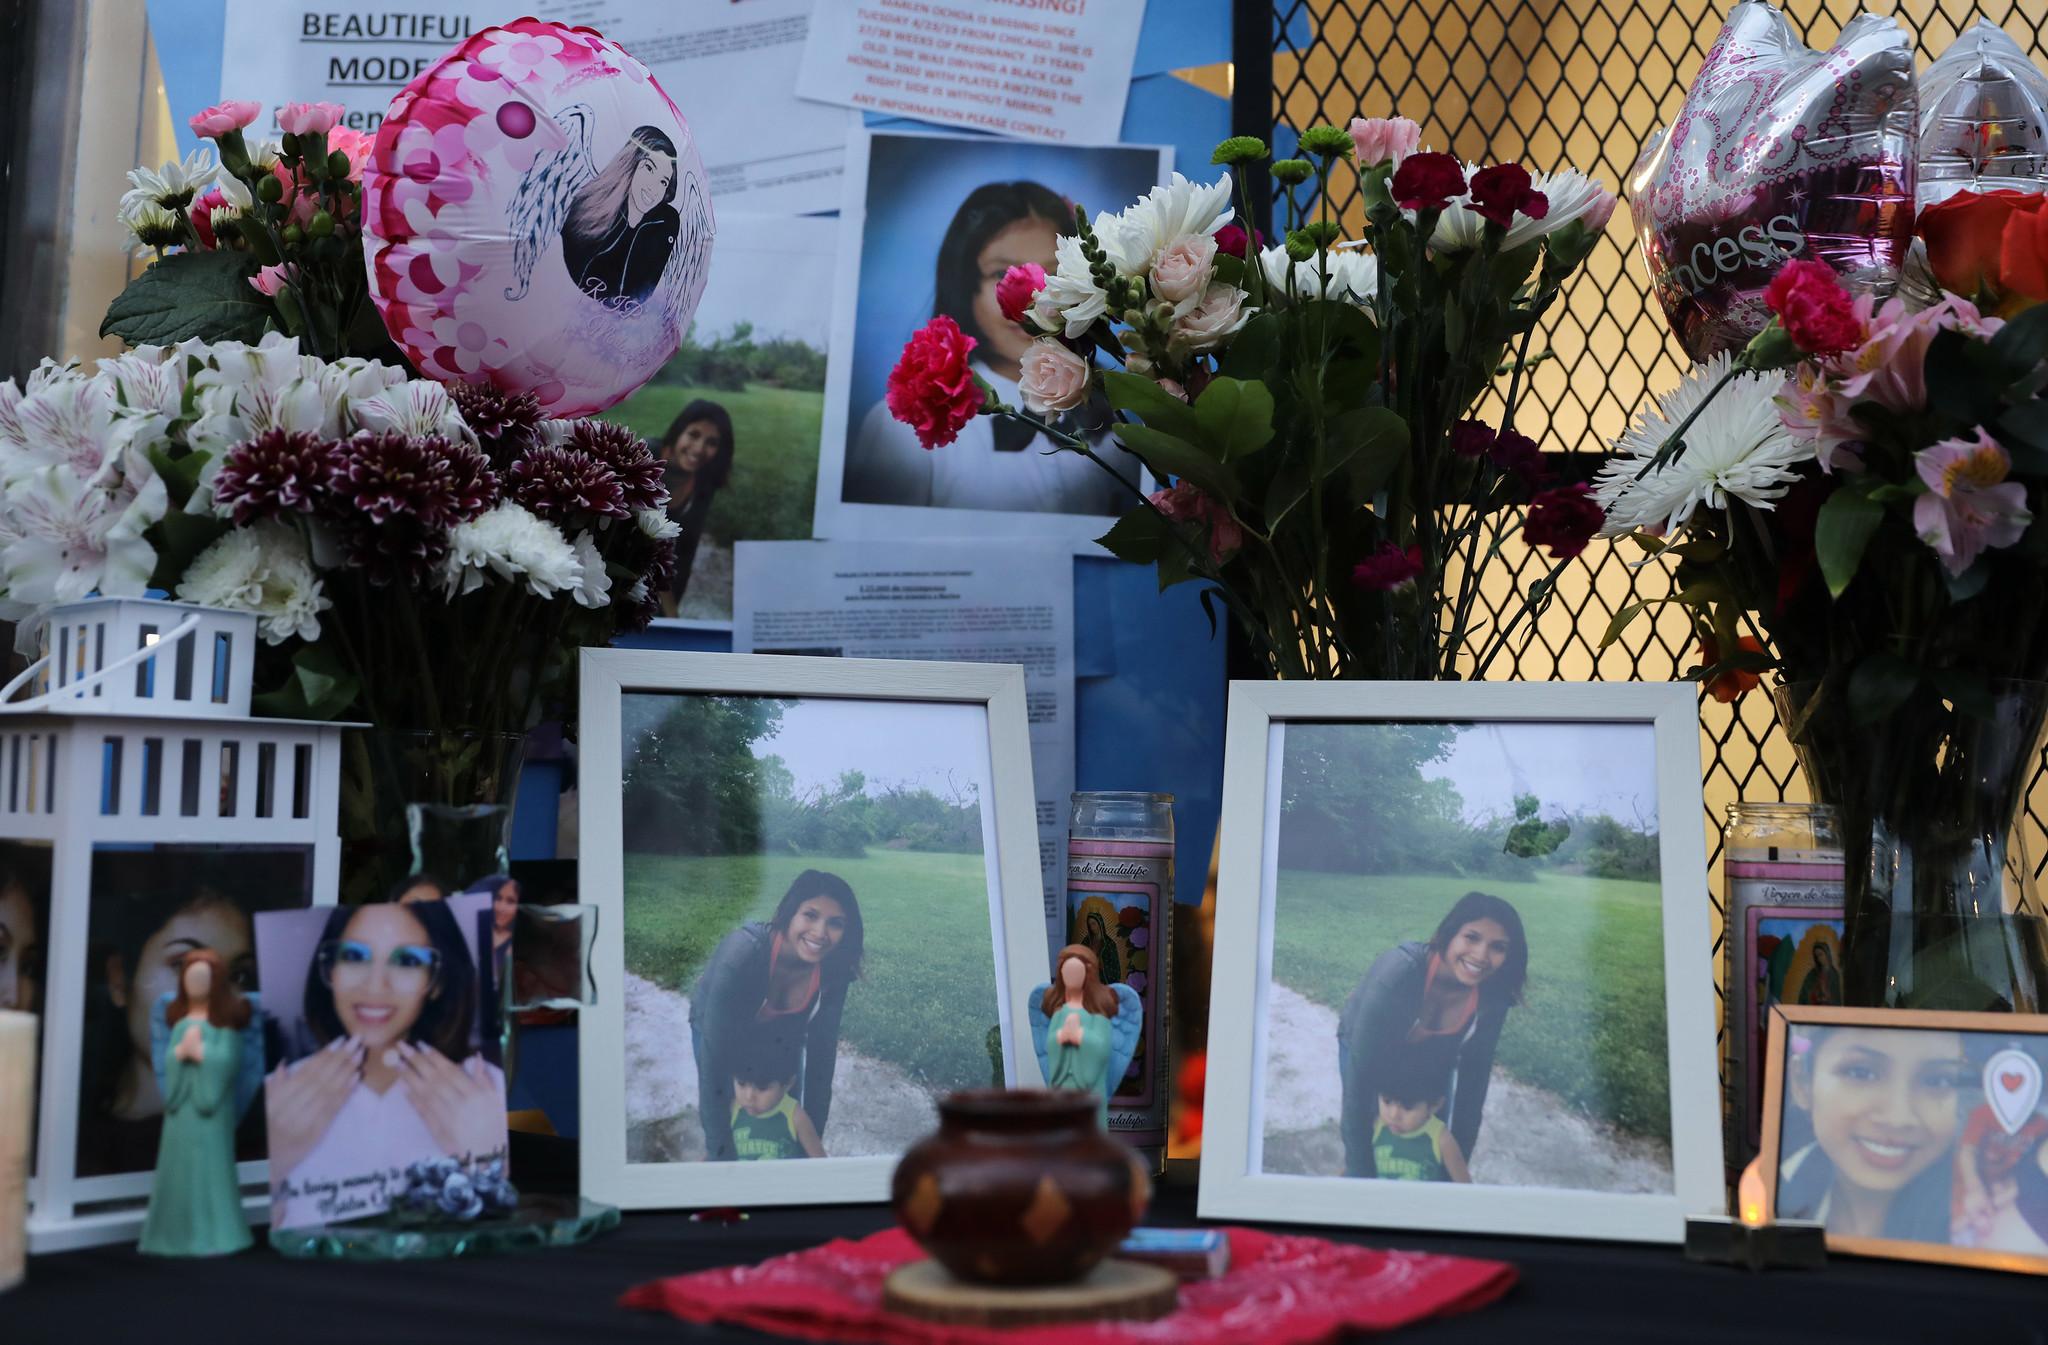 Crowds gather to mourn Marlen Ochoa-Lopez during visitation